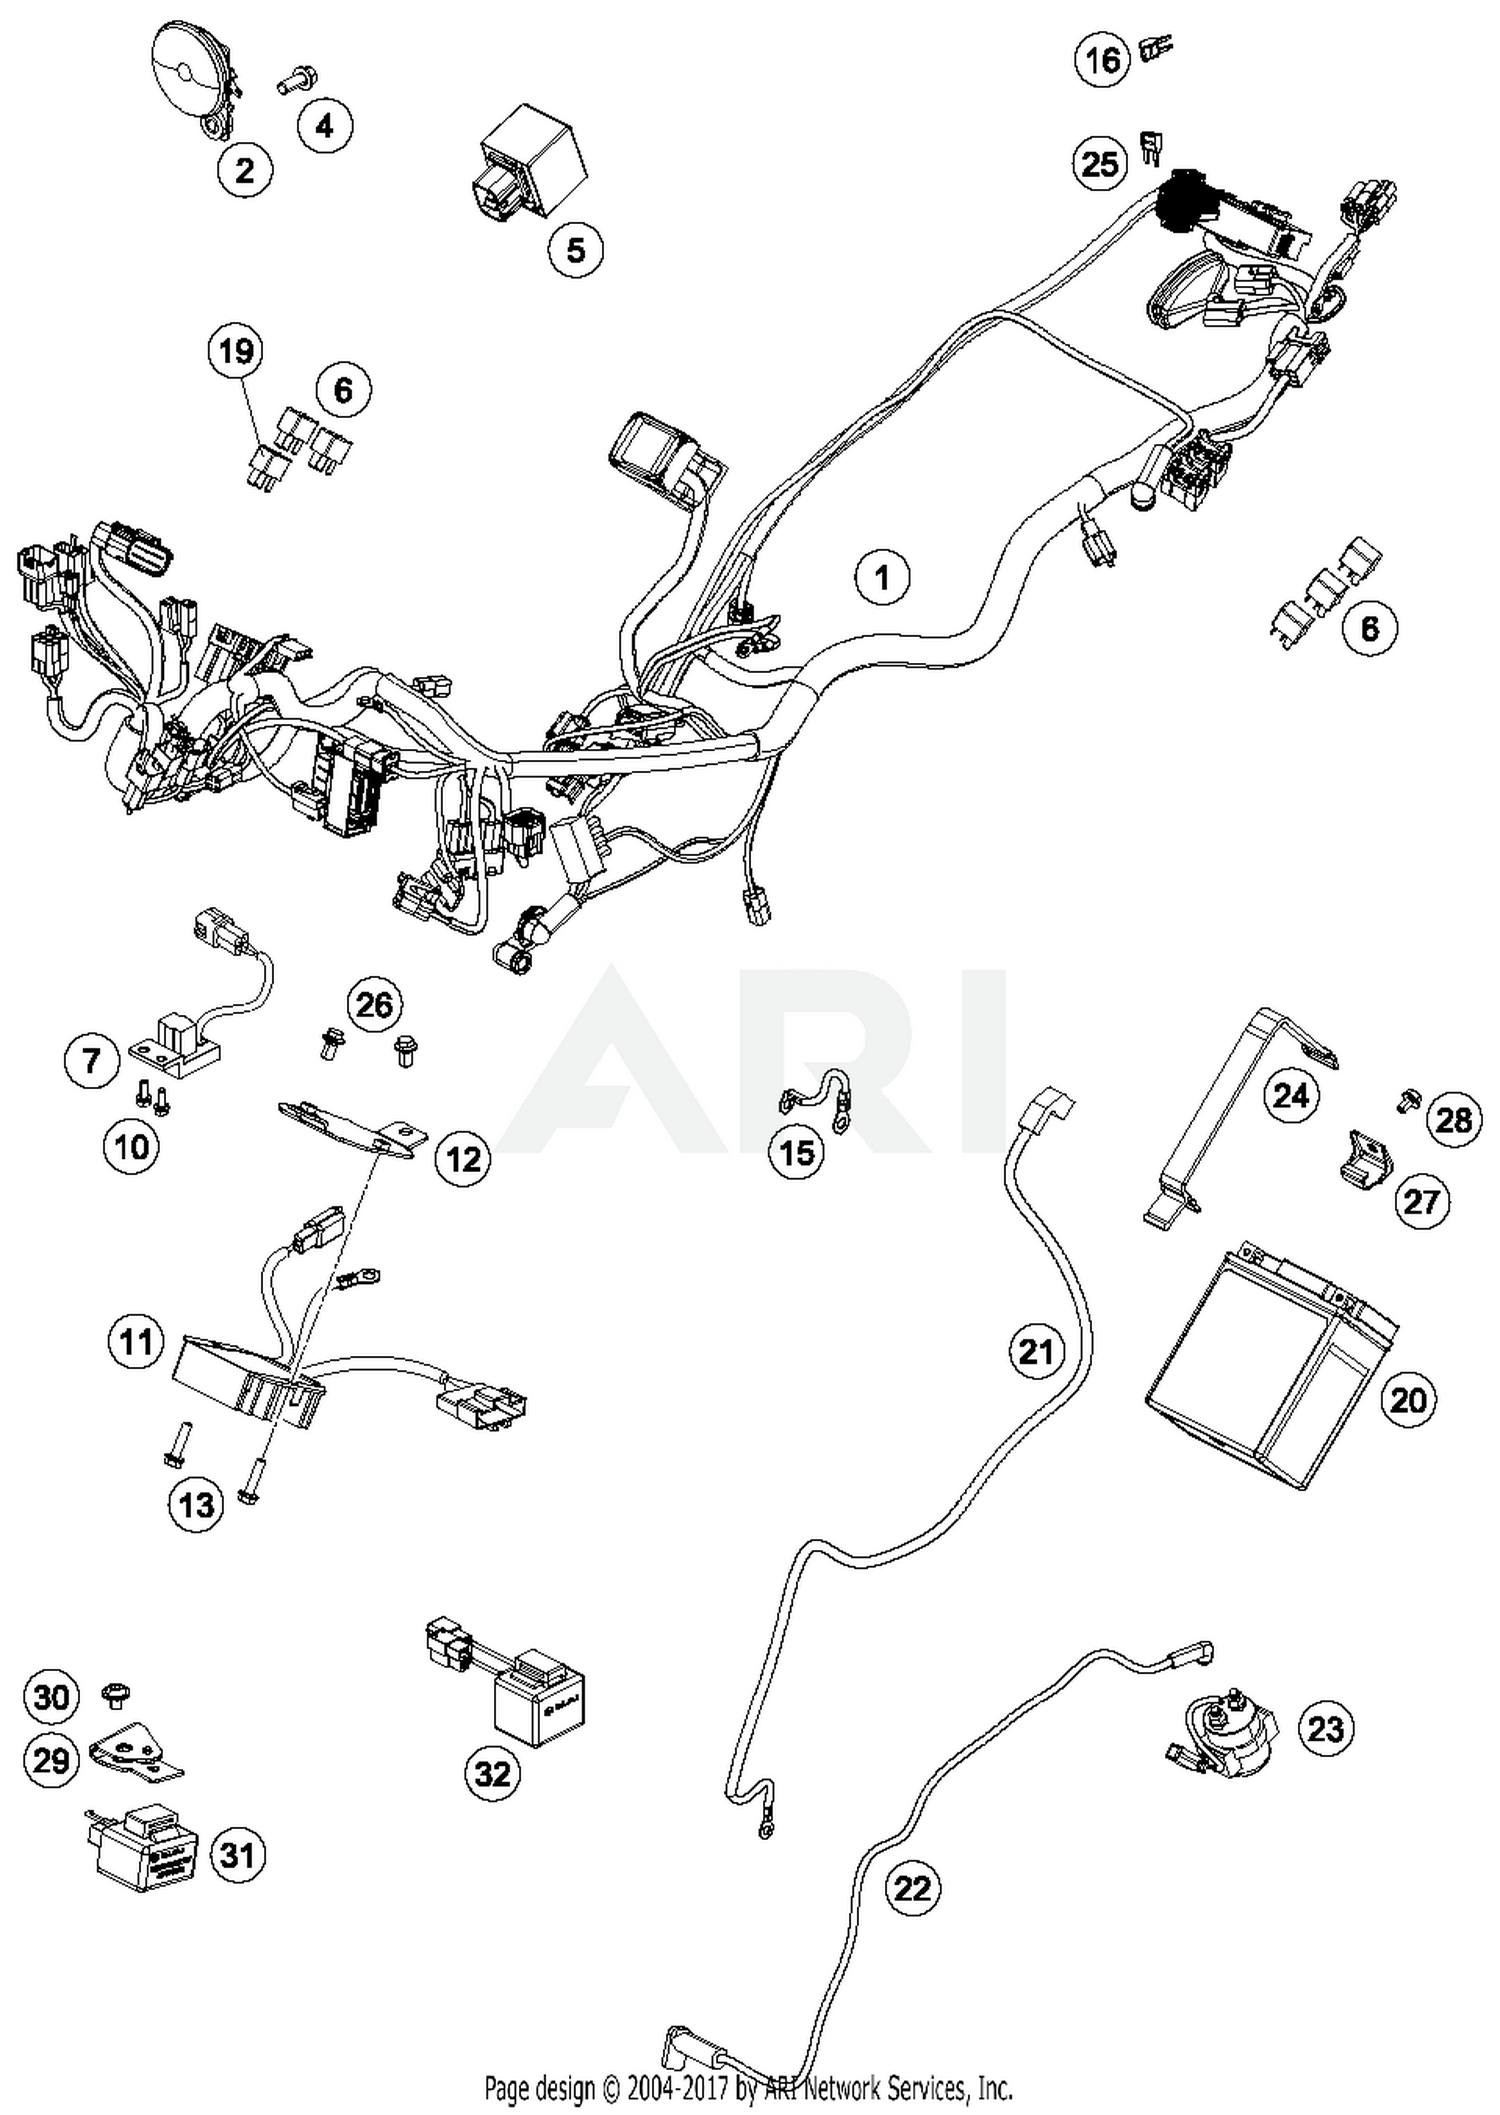 ktm headlight wiring diagram xt 5589  ktm duke wiring diagram  xt 5589  ktm duke wiring diagram